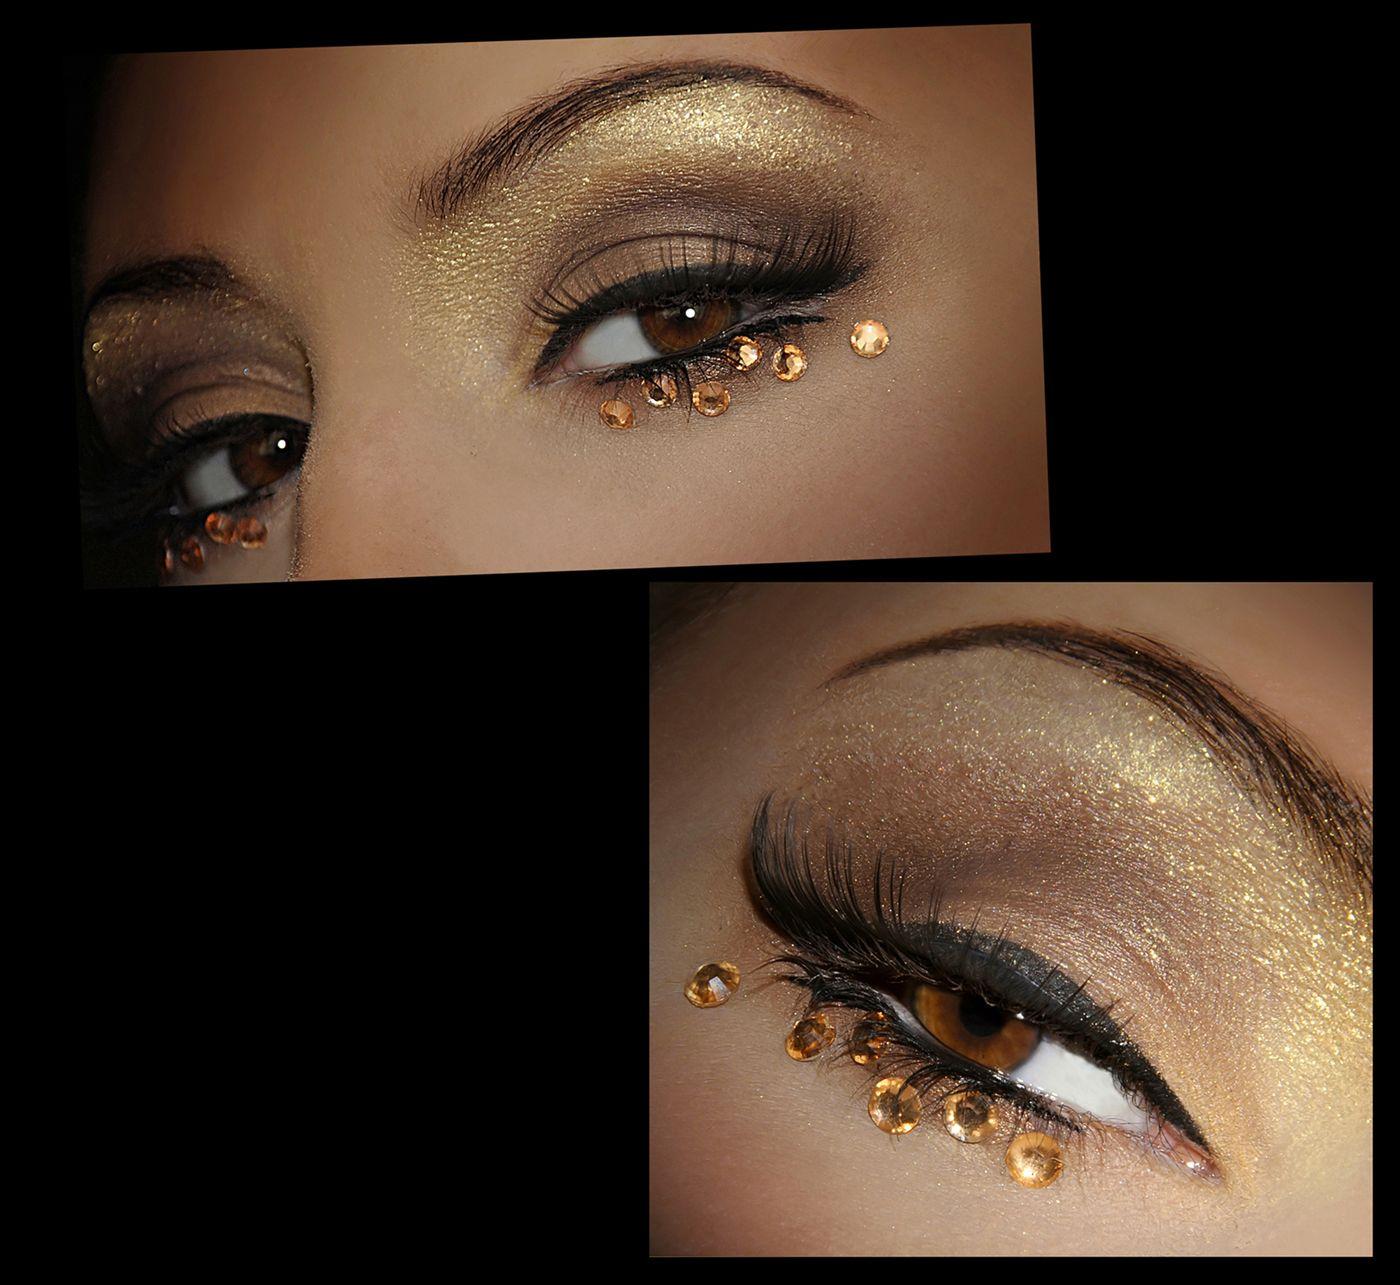 Love the eye make up....the rhinestones not so much. Eye